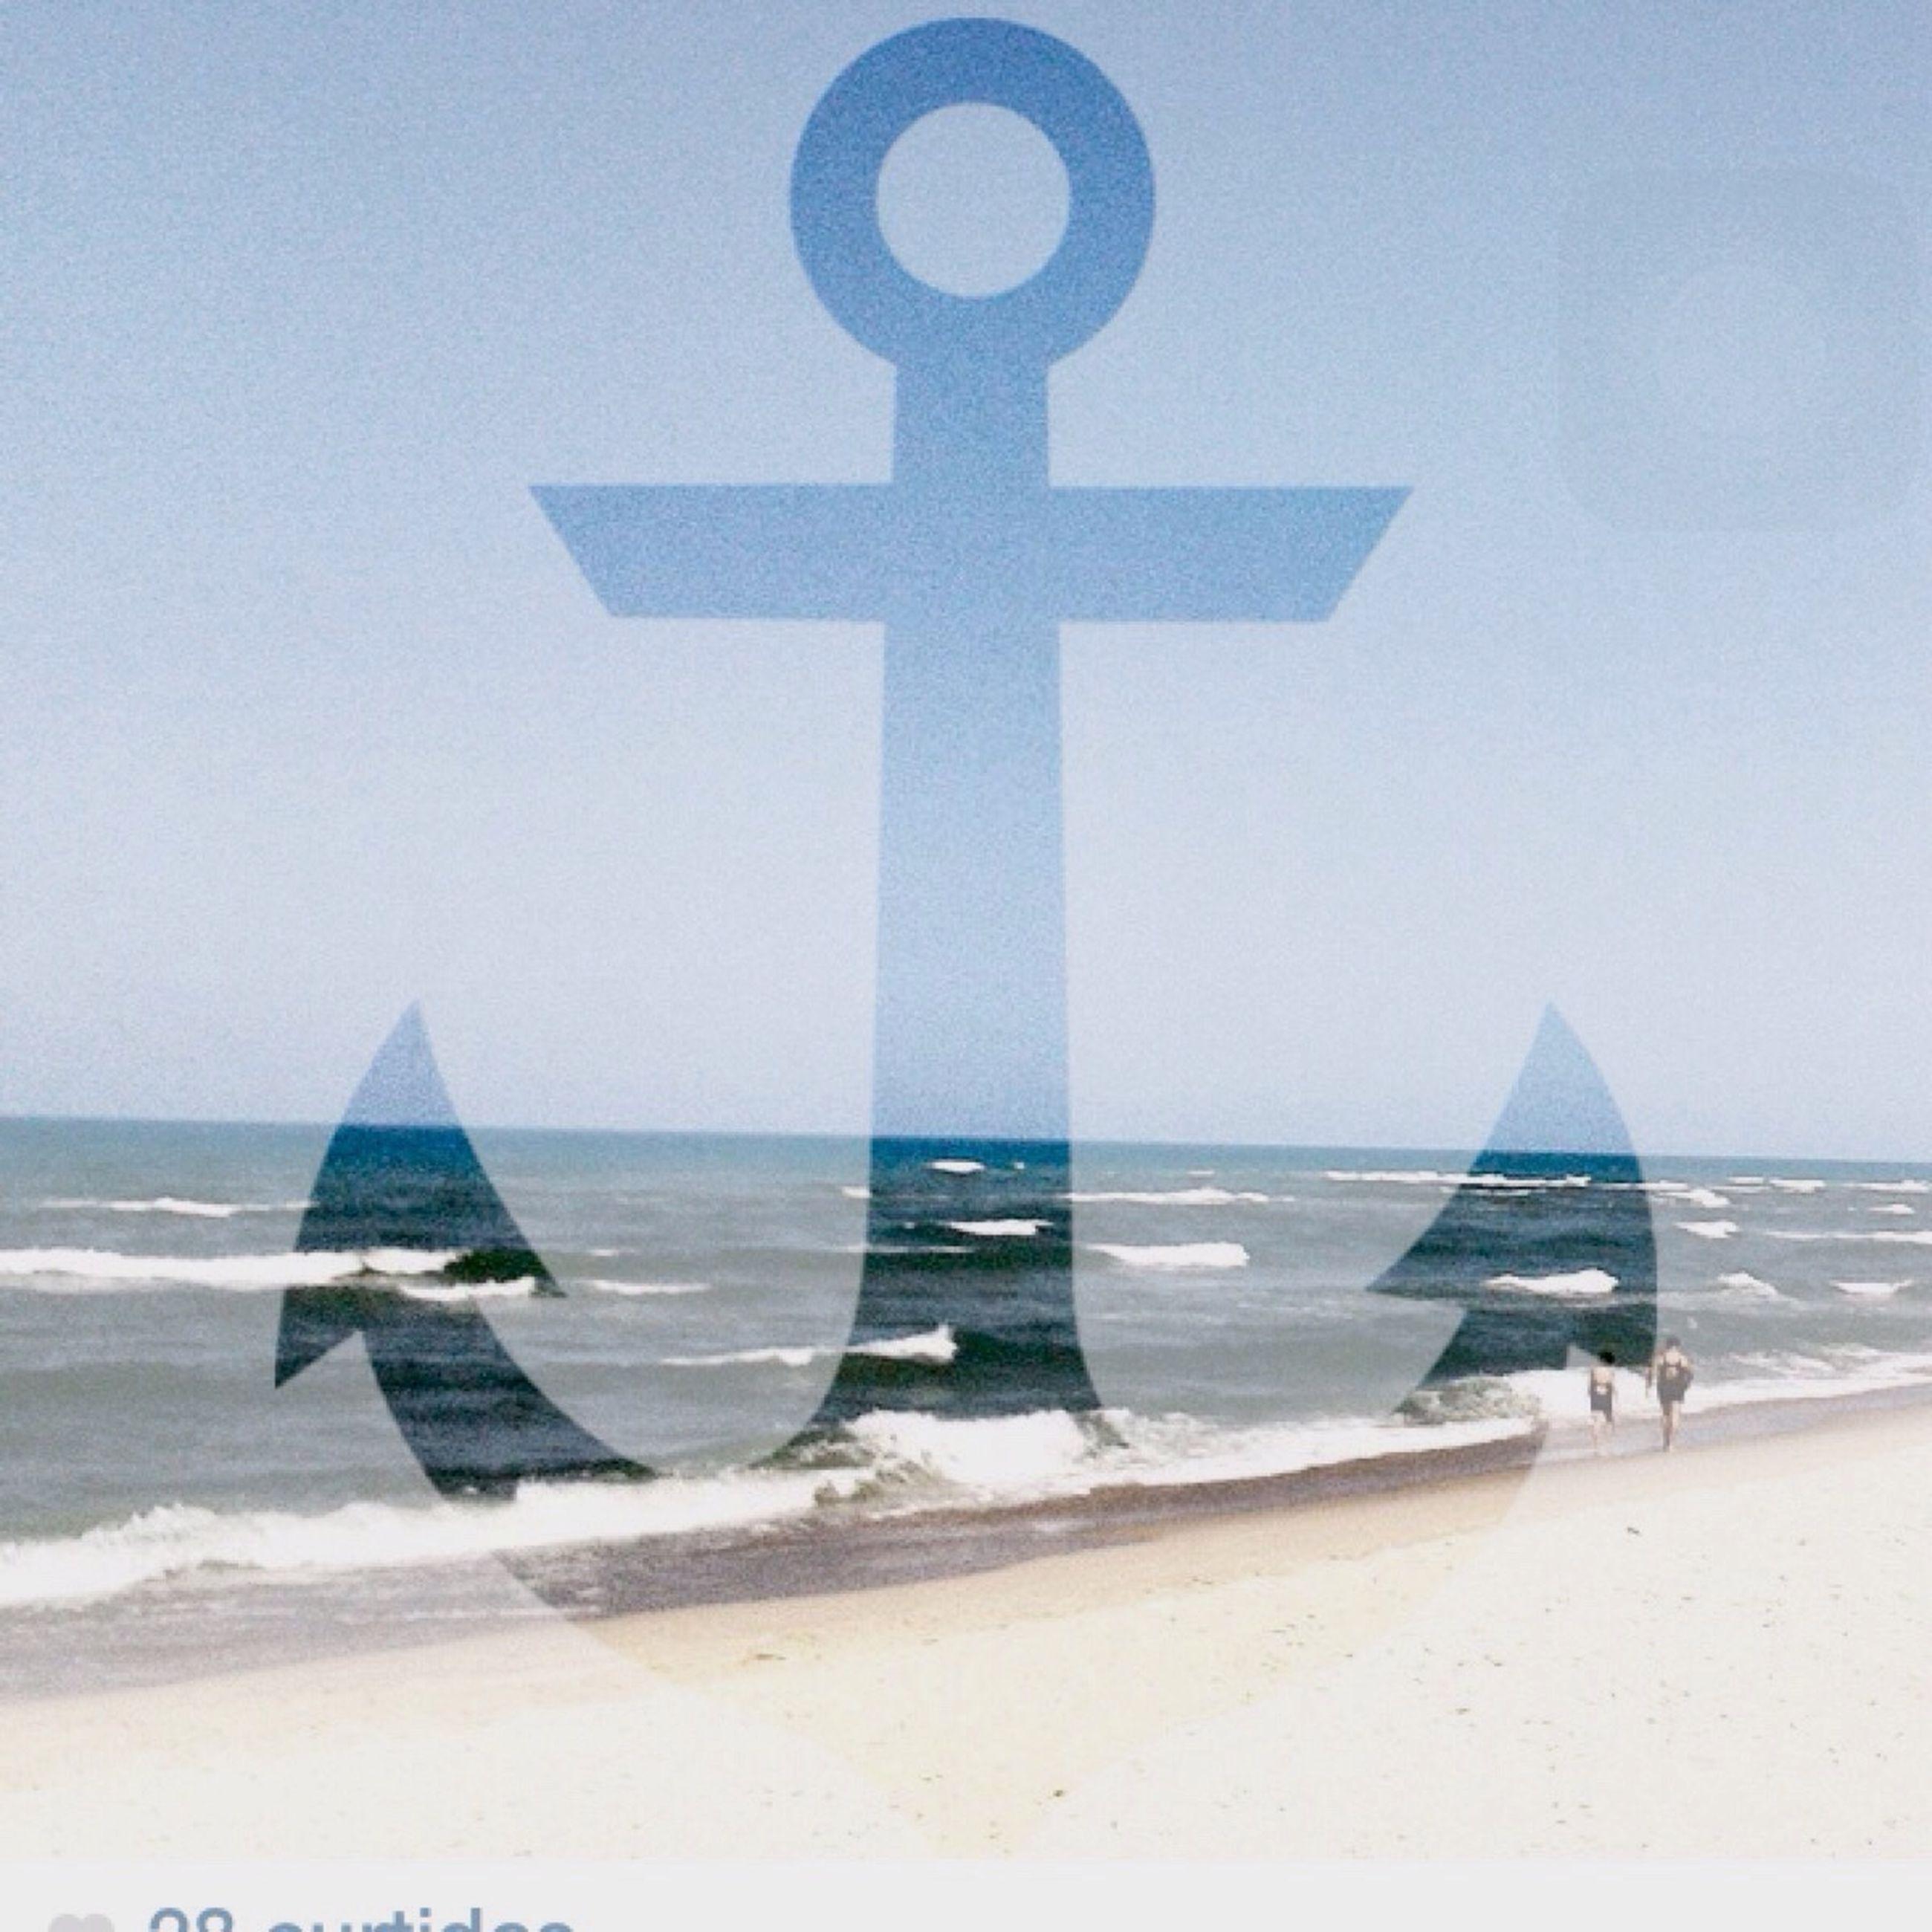 sea, water, horizon over water, beach, human representation, clear sky, art and craft, shore, religion, sculpture, art, sand, creativity, statue, sky, cross, day, spirituality, tourism